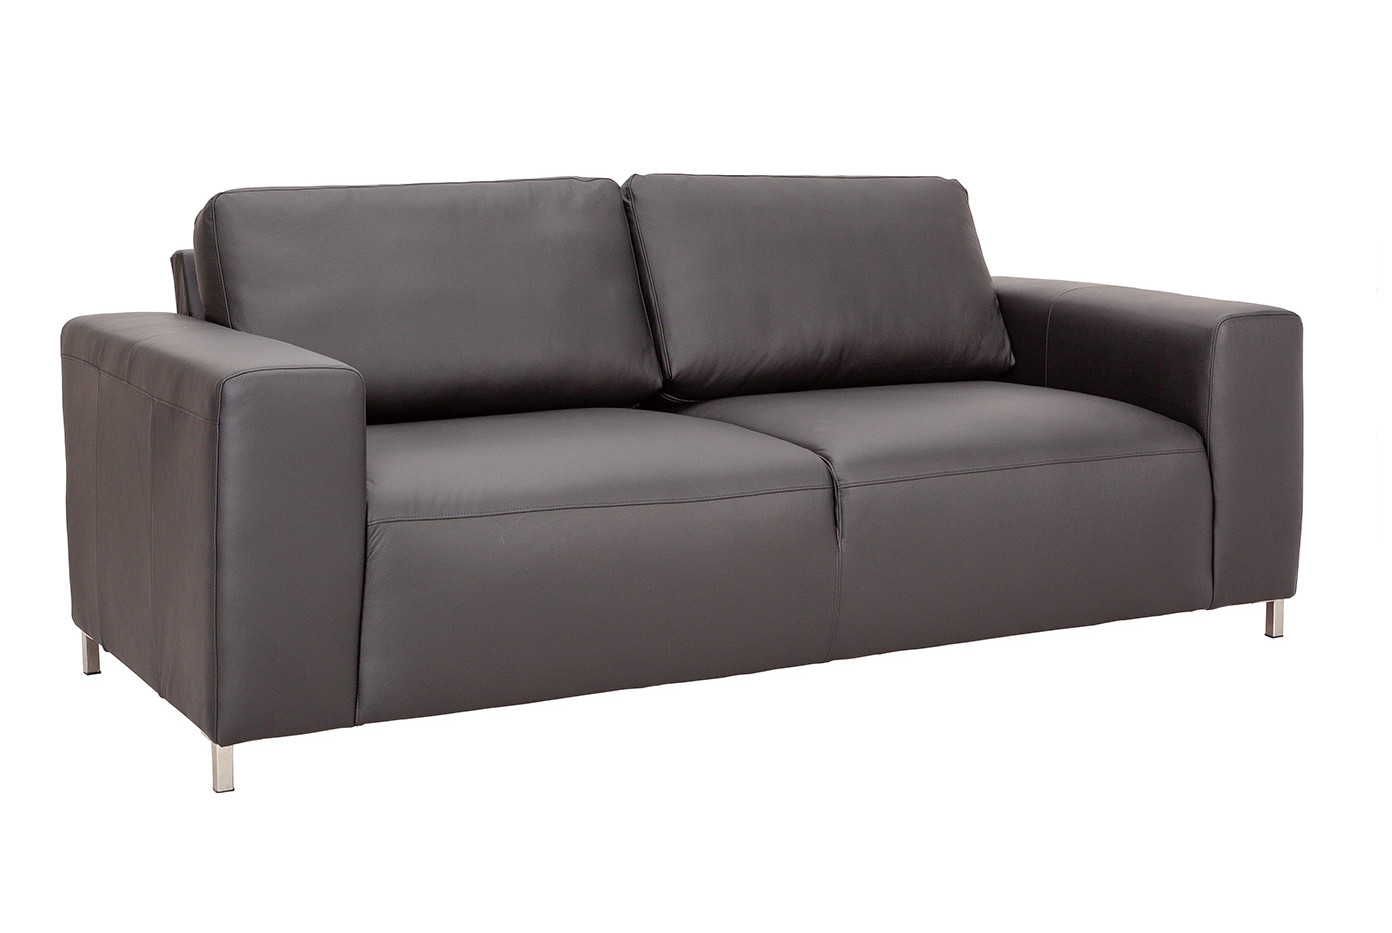 Vision 2,5so 730 black leather